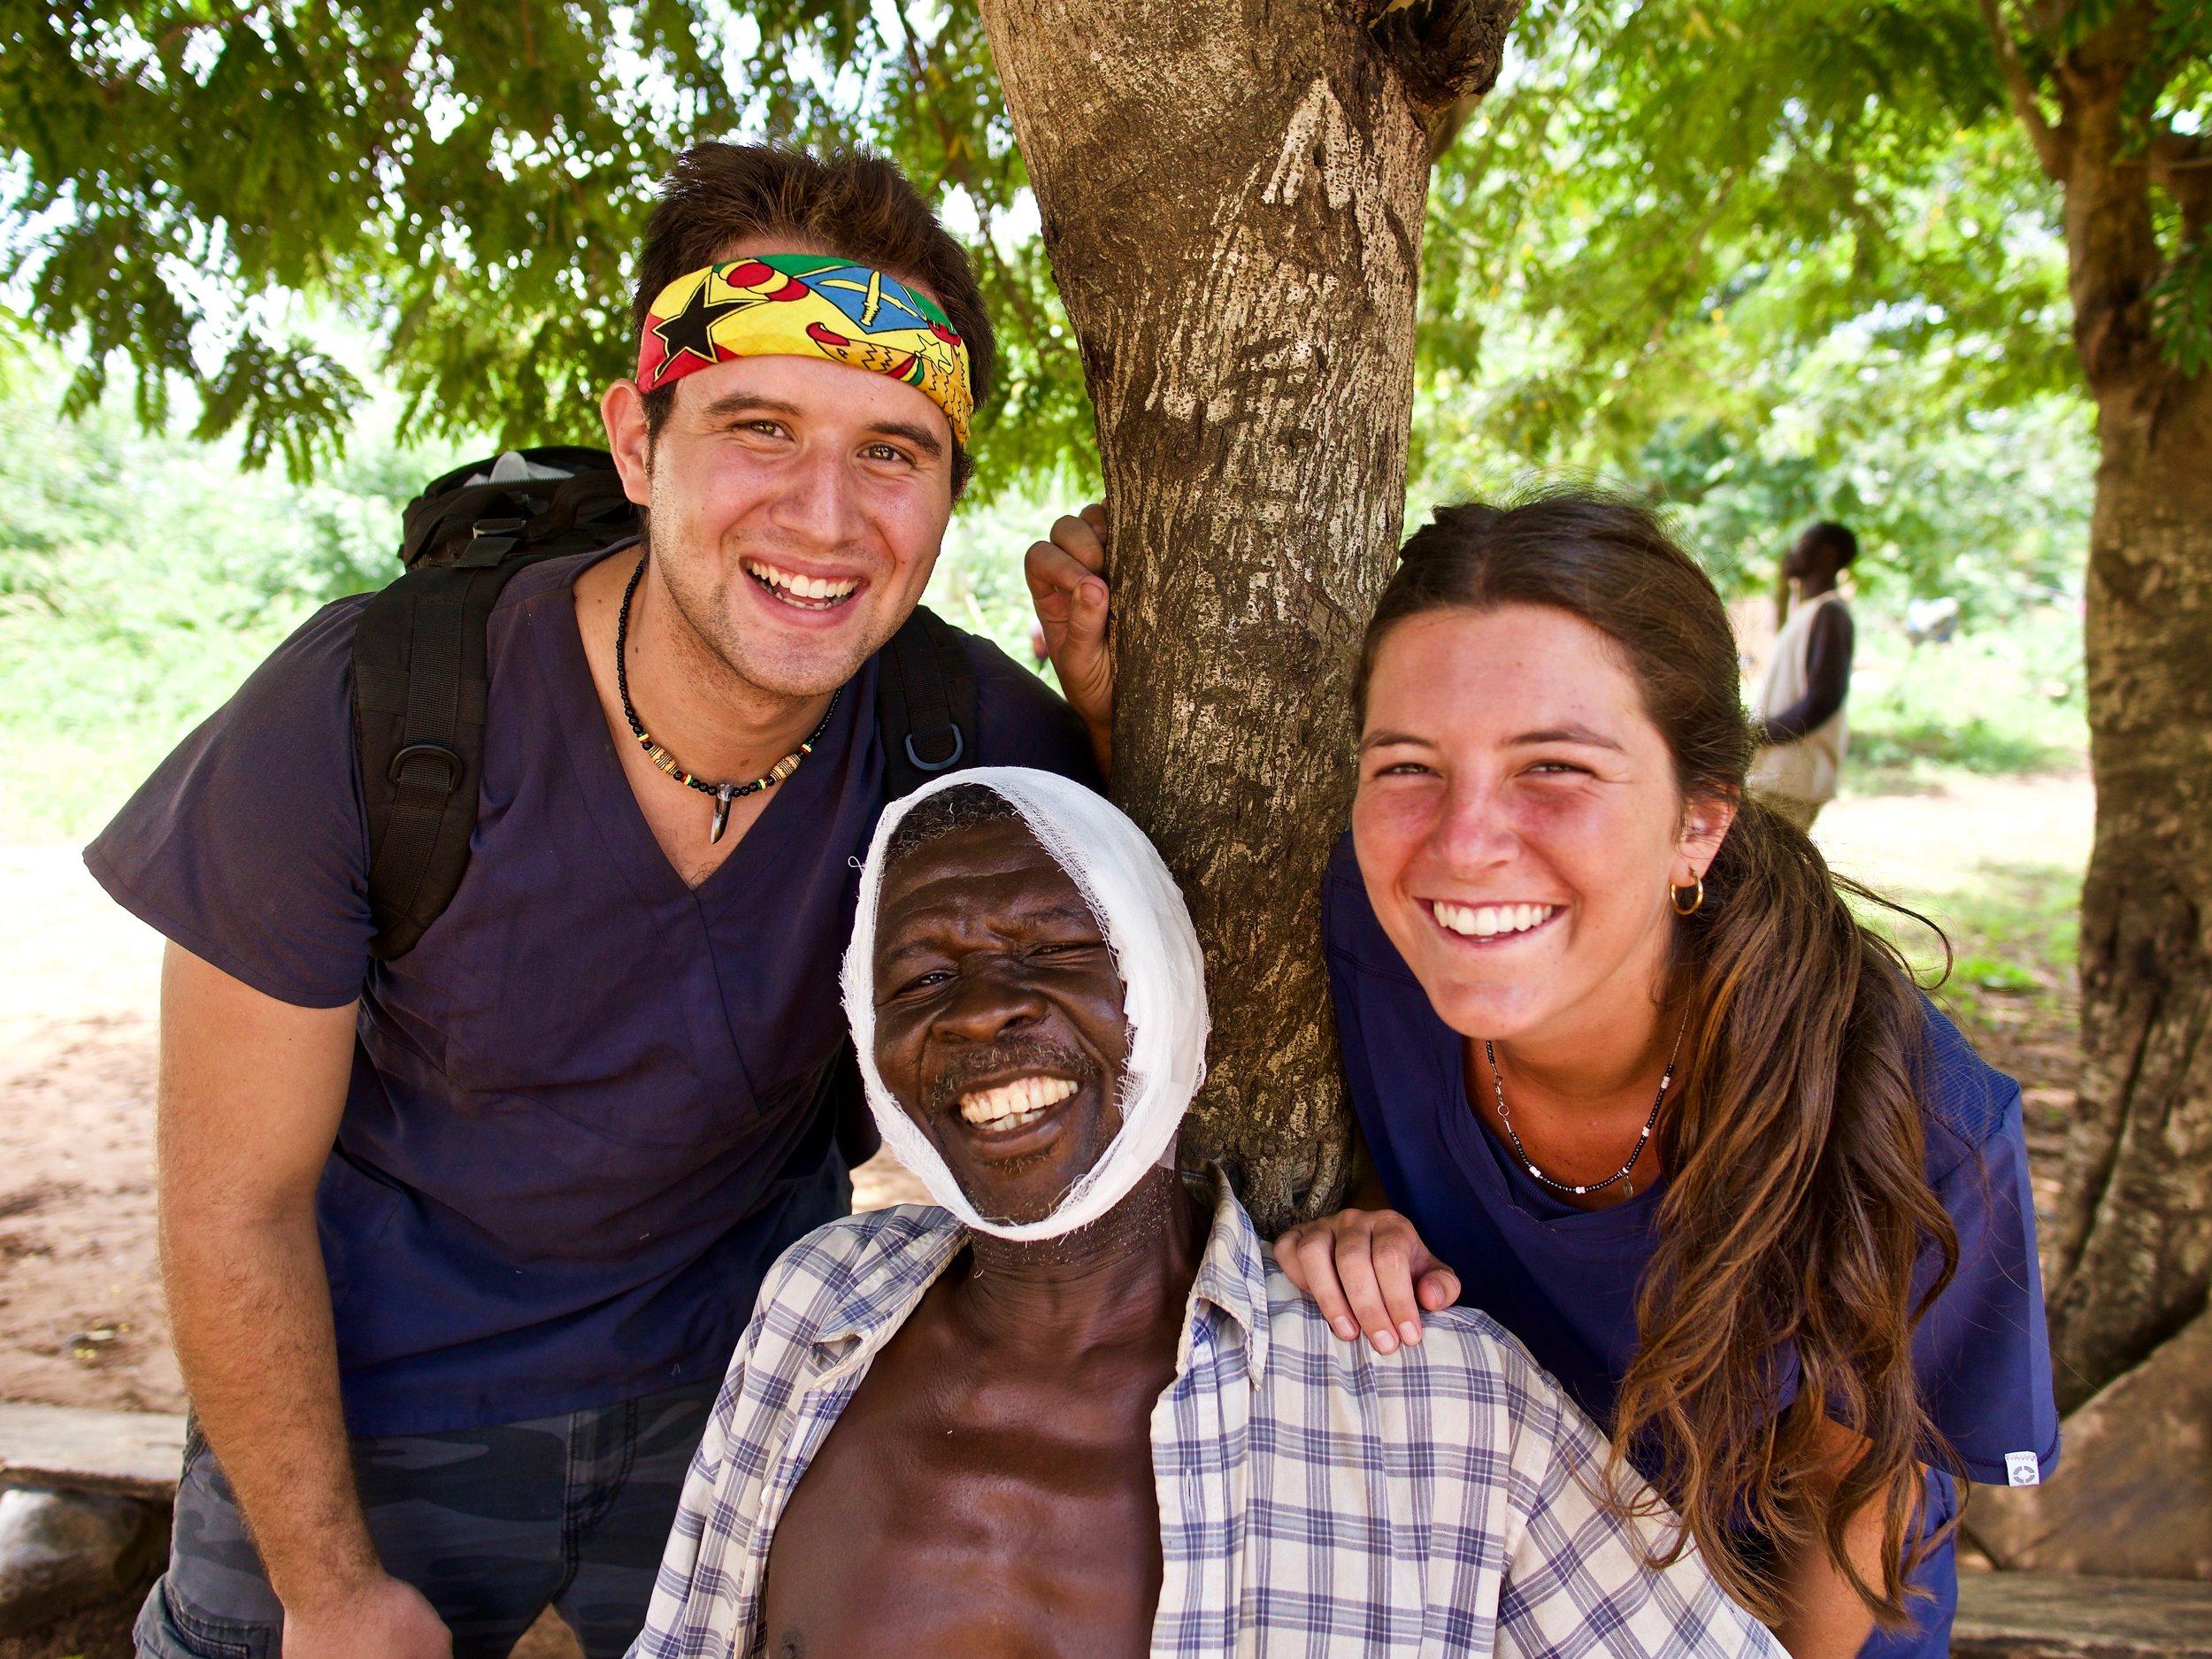 Mane & Kyle - Volunteers, IVHQCombined efforts of life-changing Medical Care in rural Ghana.